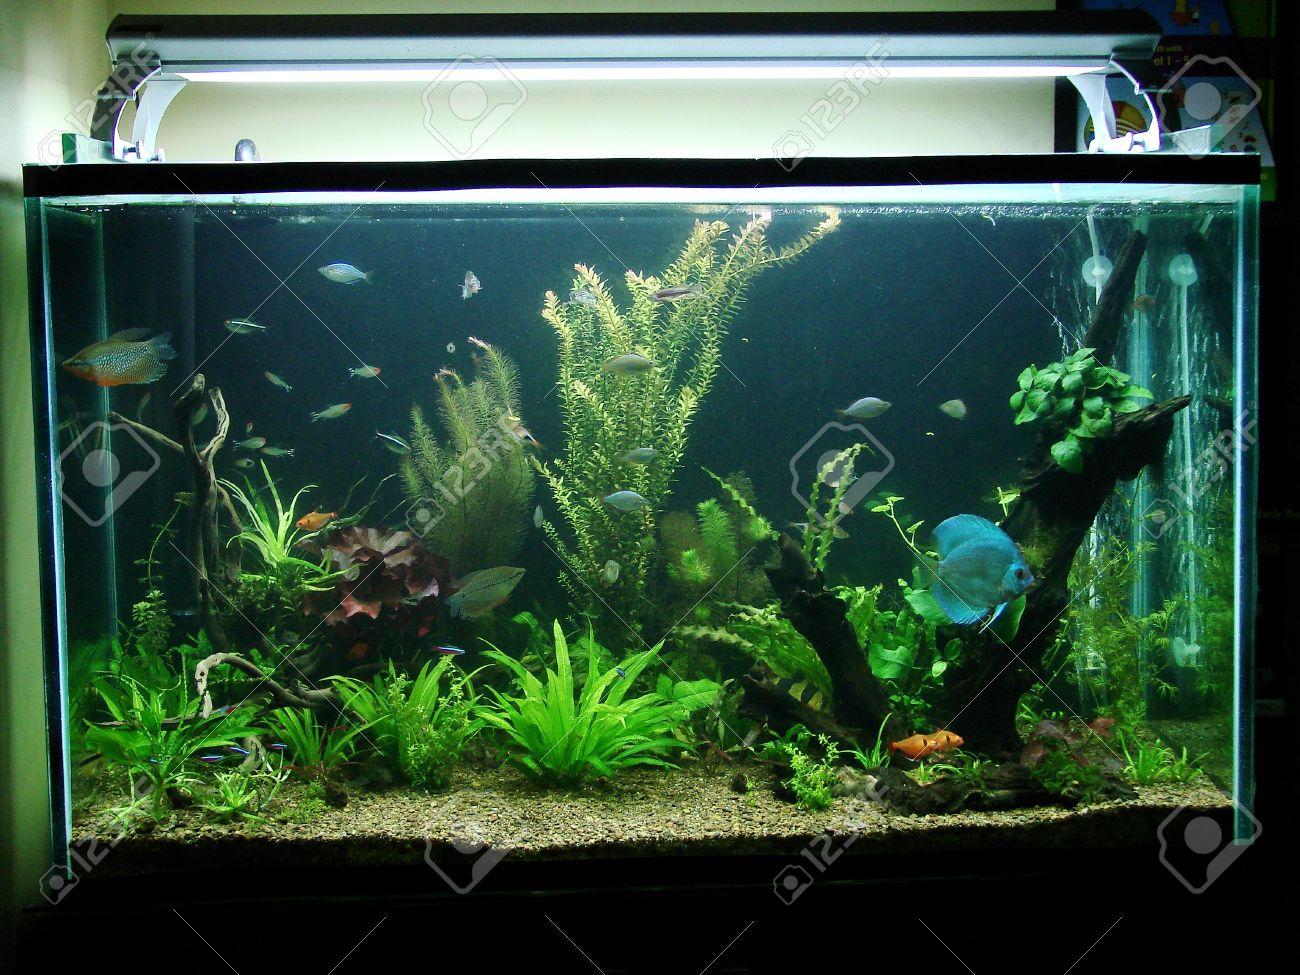 Planted Nature Aquarium Featuring An Amazon River Biotope Stock